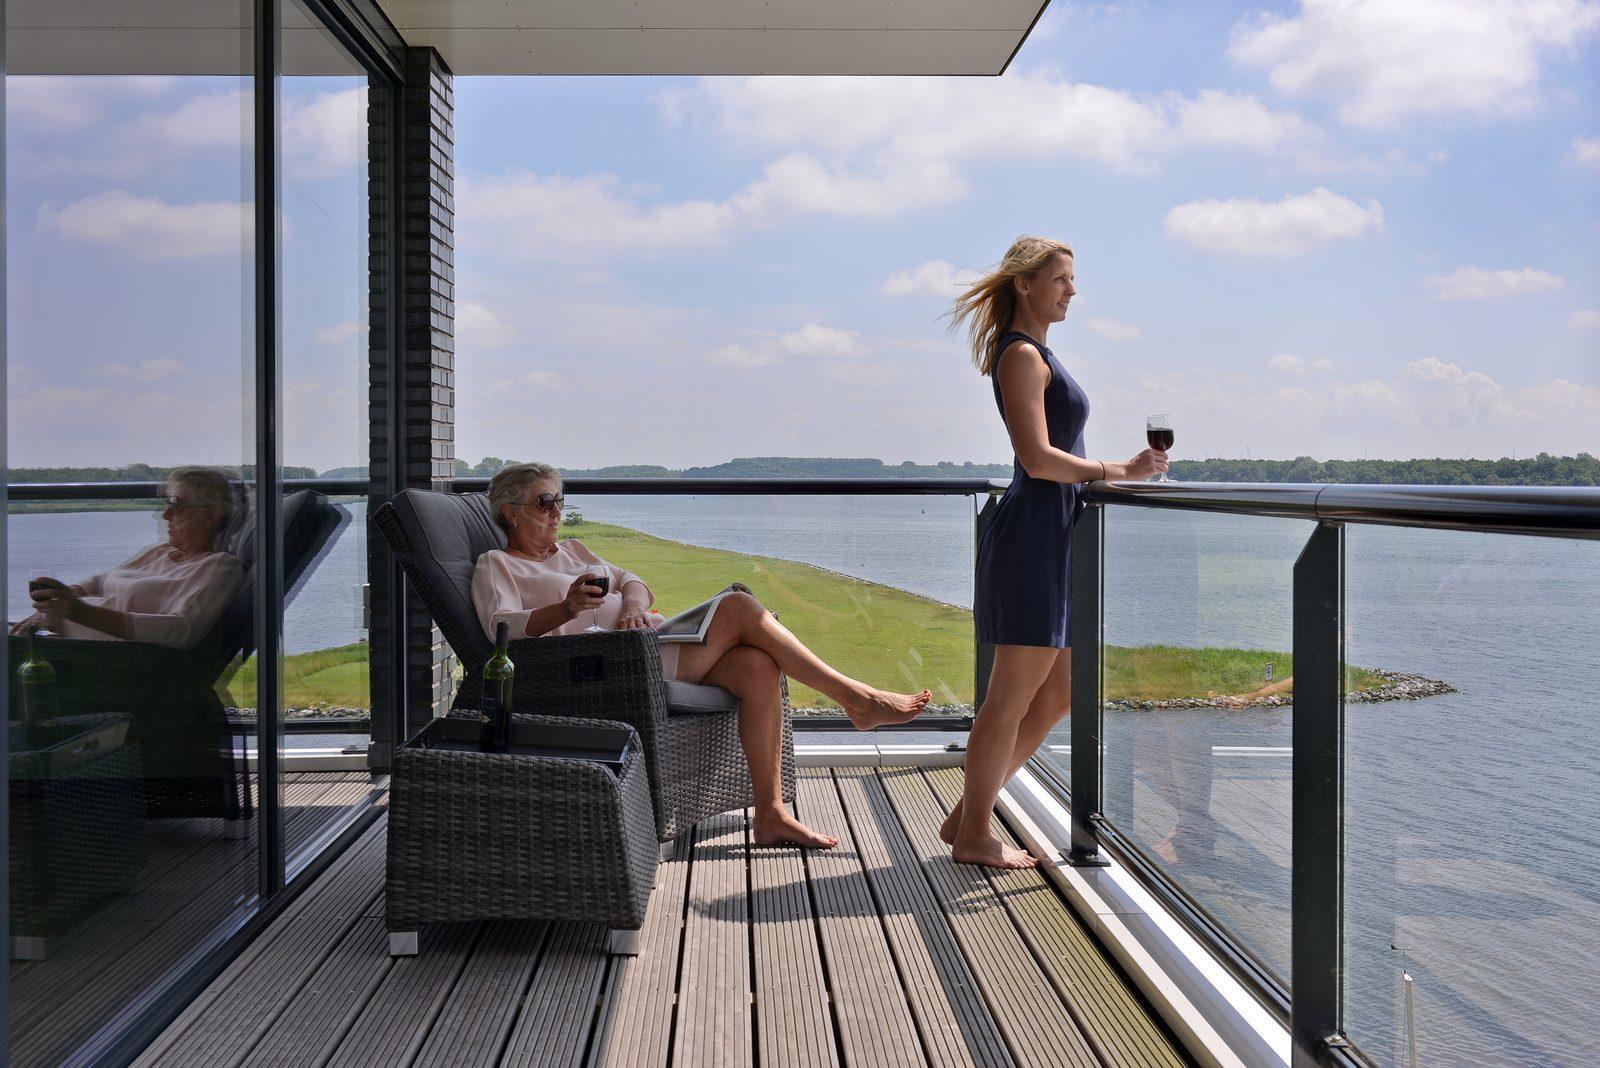 Luxury holiday at the Veerse meer